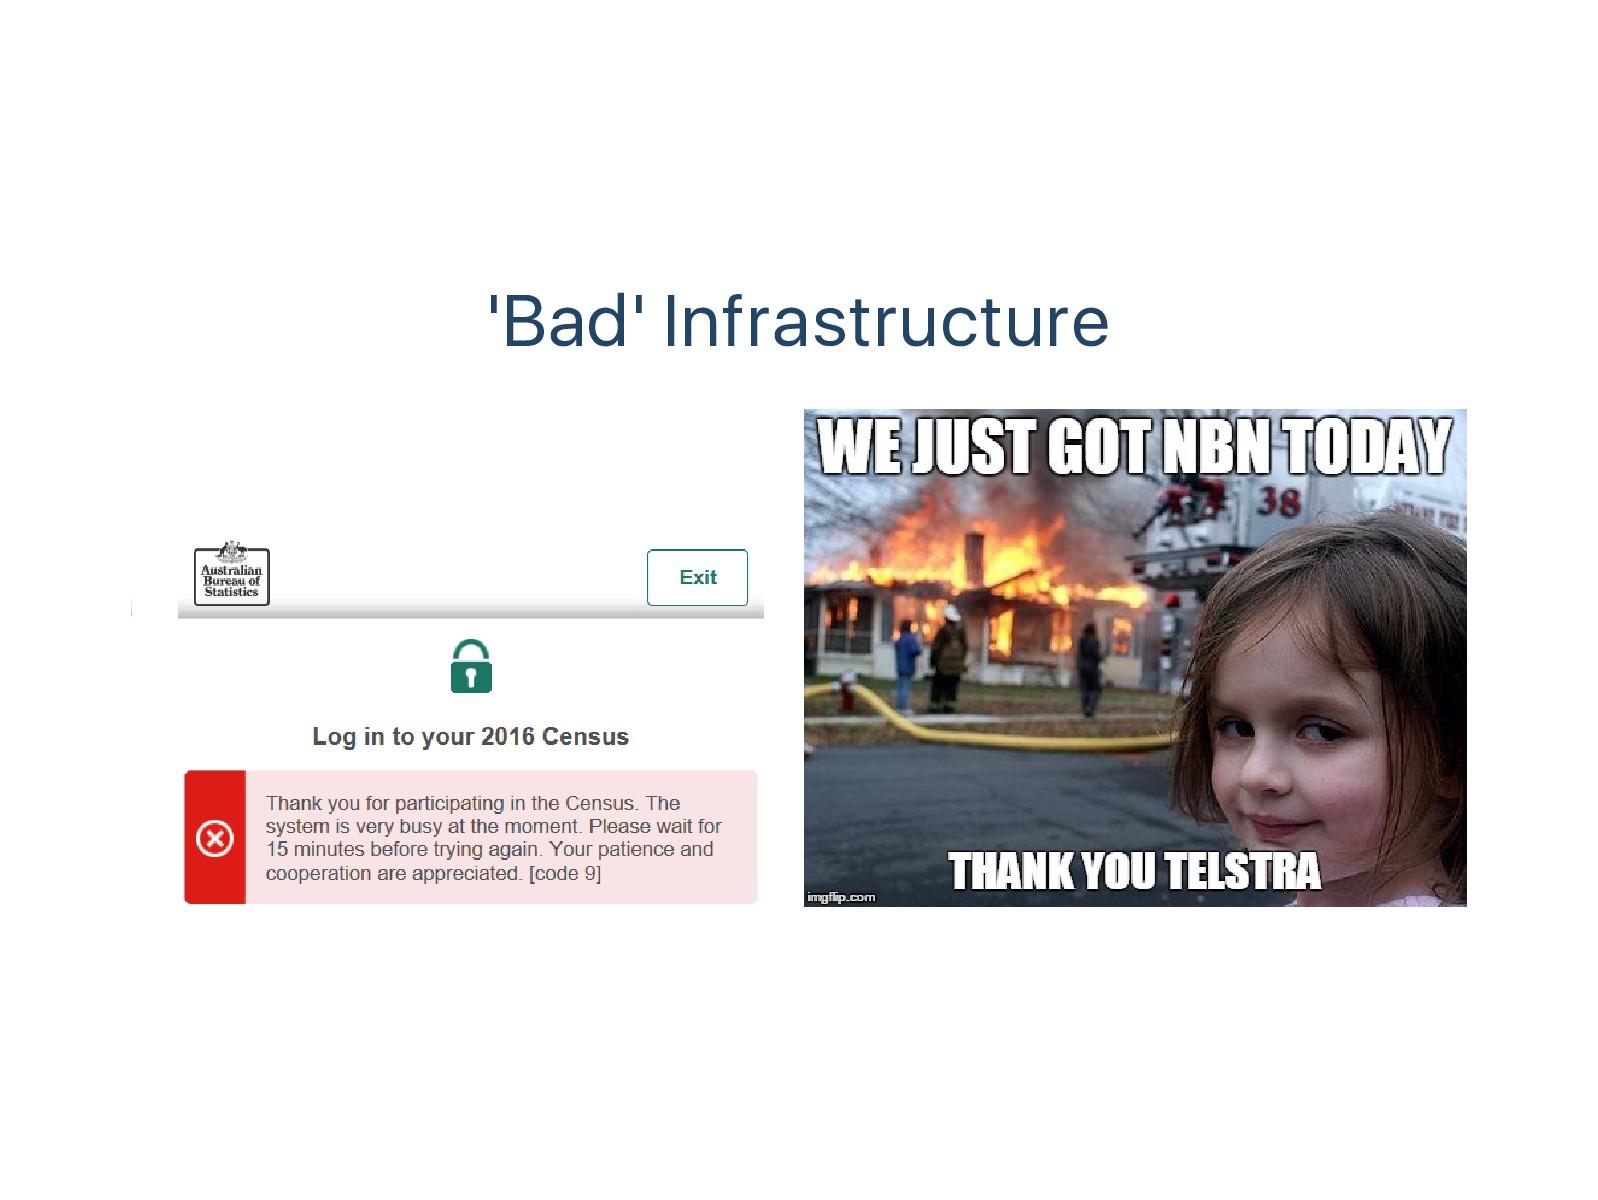 'Bad' Infrastructure